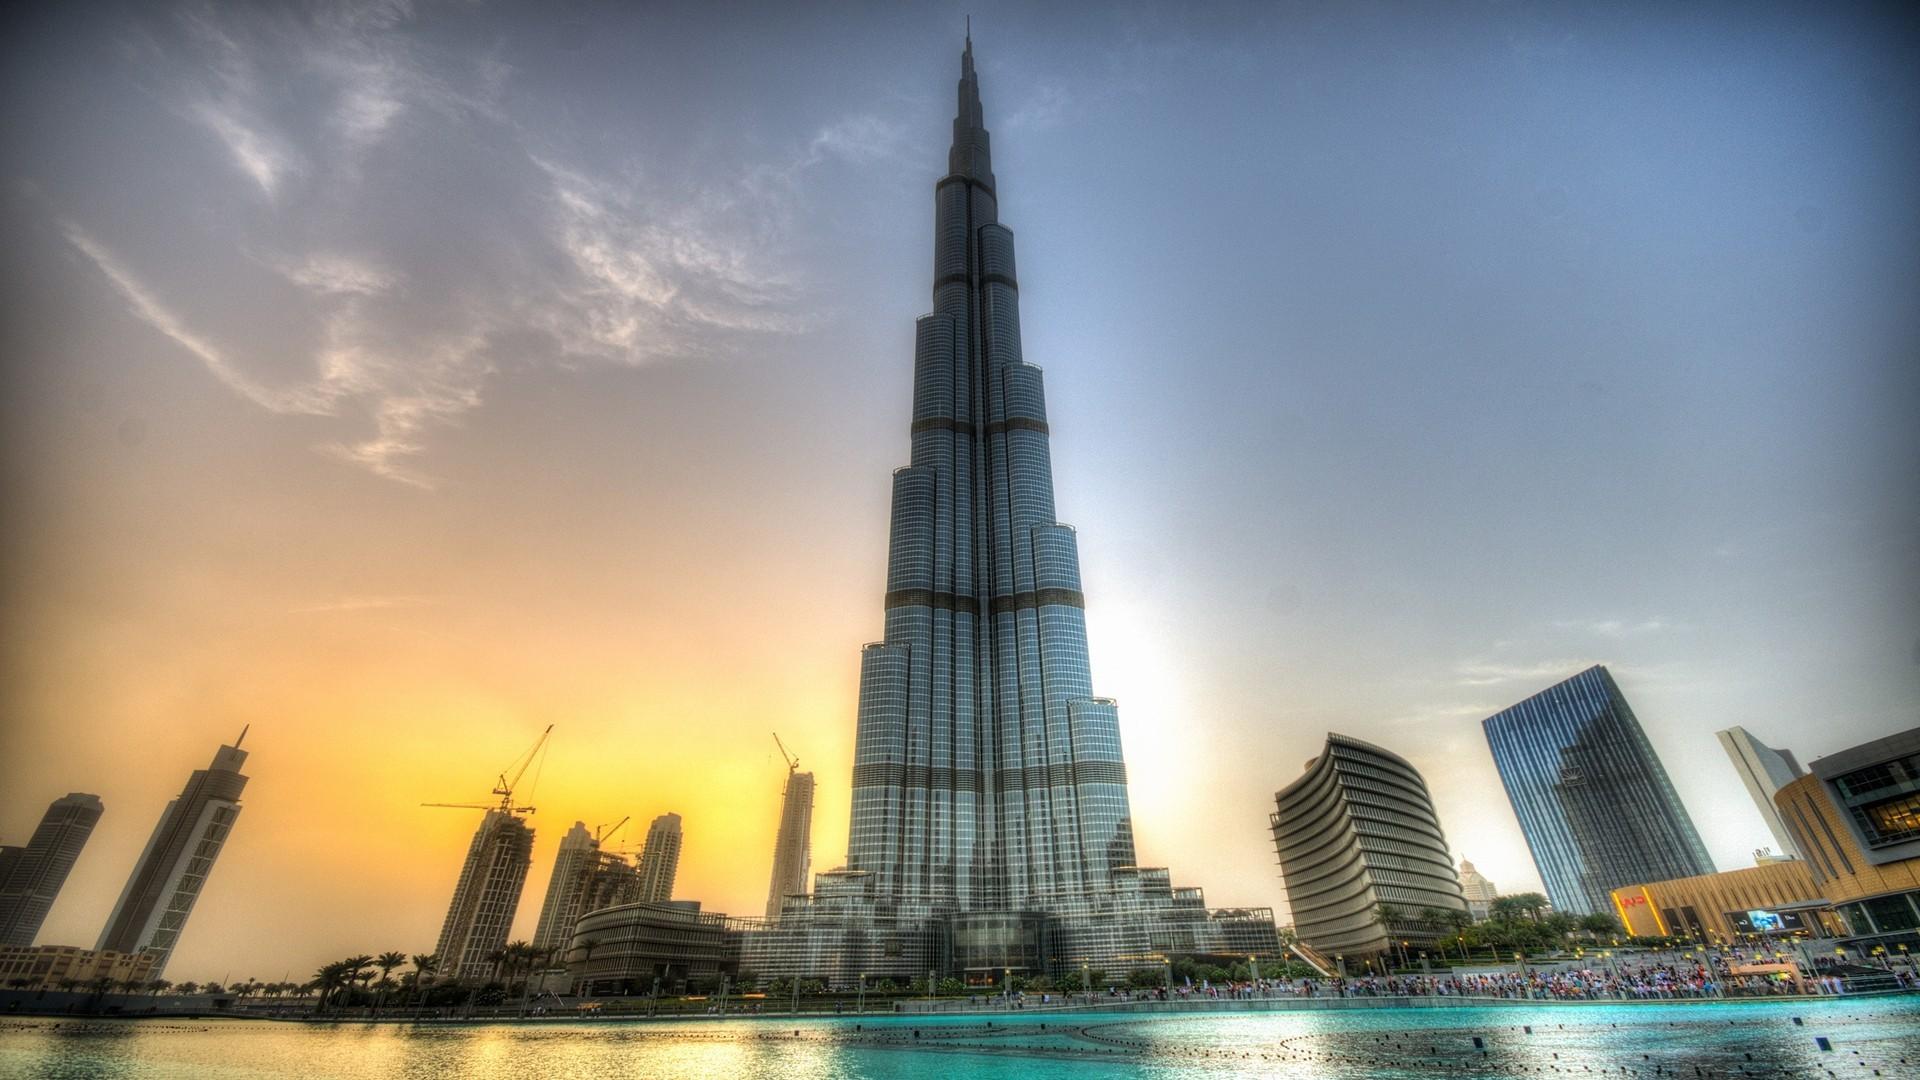 Burj Khalifa Download